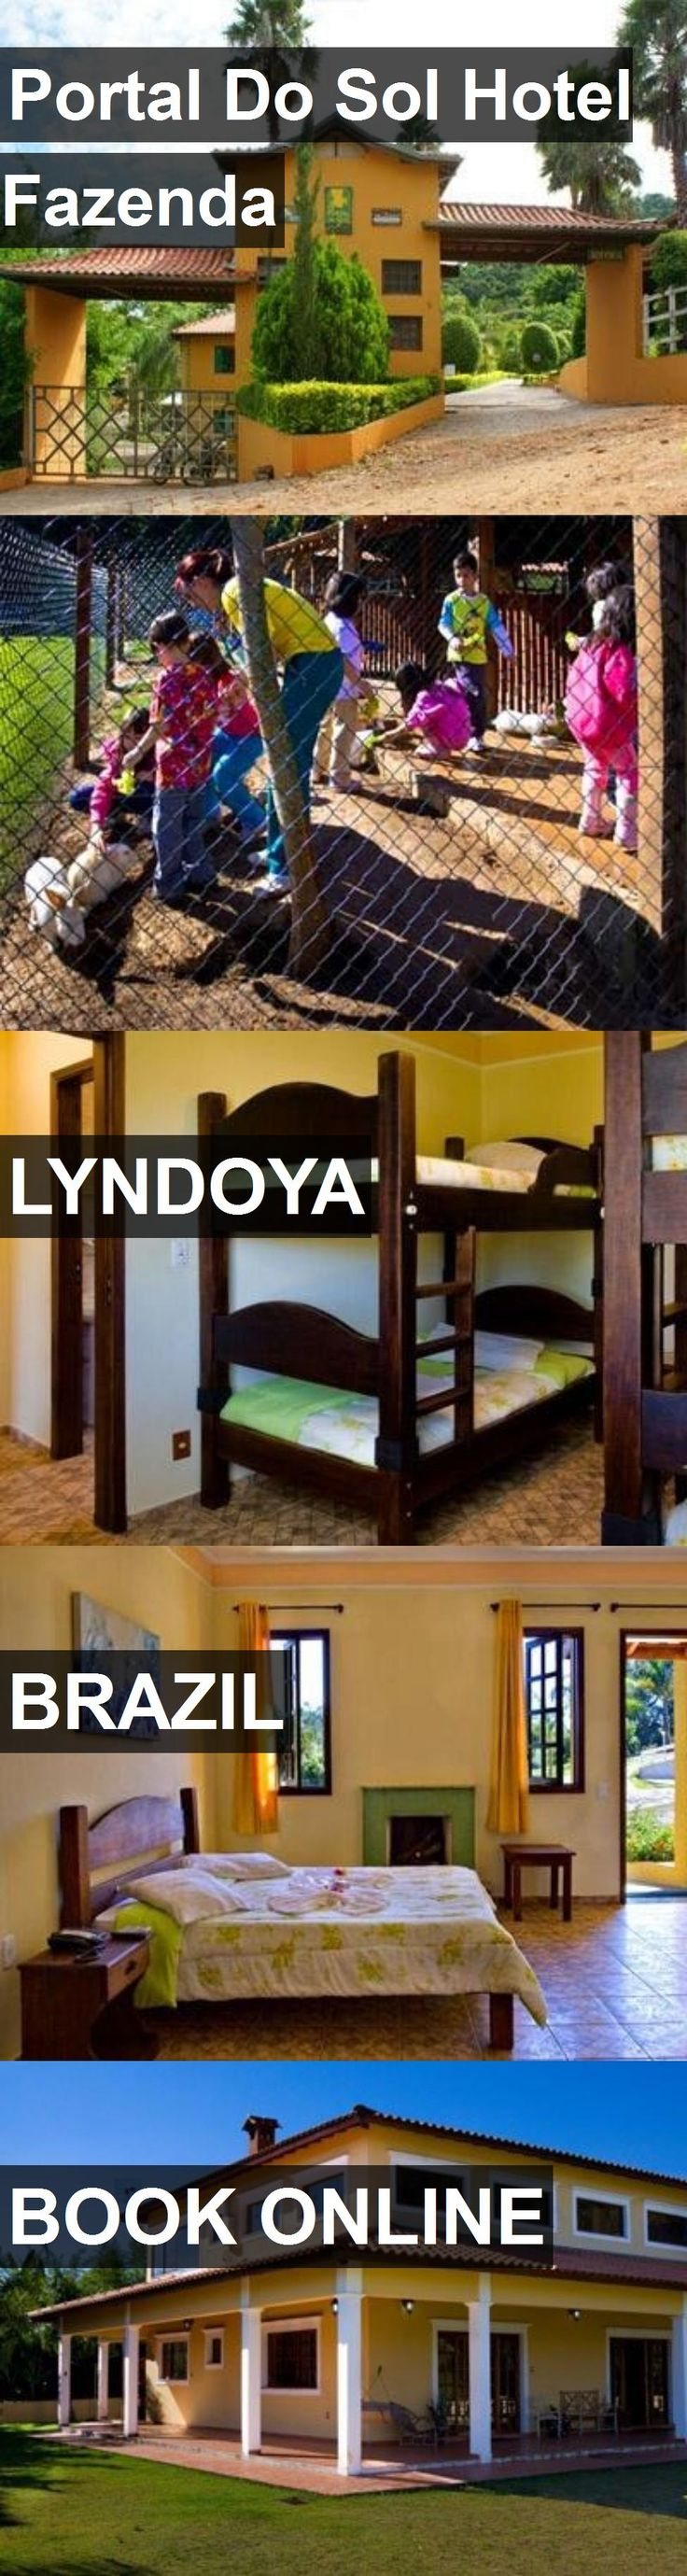 Portal Do Sol Hotel Fazenda in Lyndoya, Brazil. For more information, photos, reviews and best prices please follow the link. #Brazil #Lyndoya #travel #vacation #hotel